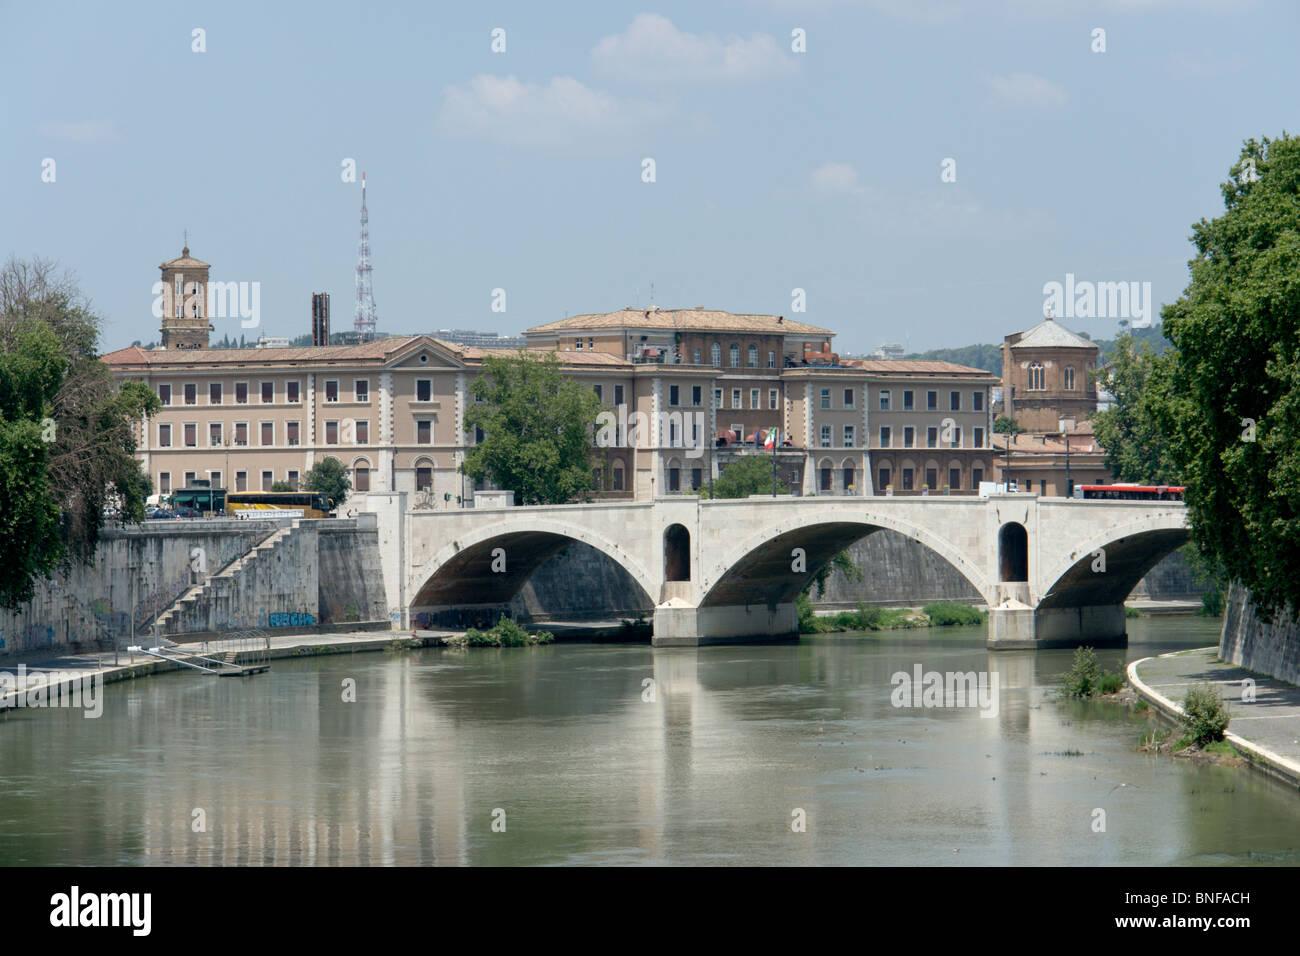 Ponte Principe Amedeo and Ospedale di Santo Spirito - Stock Image